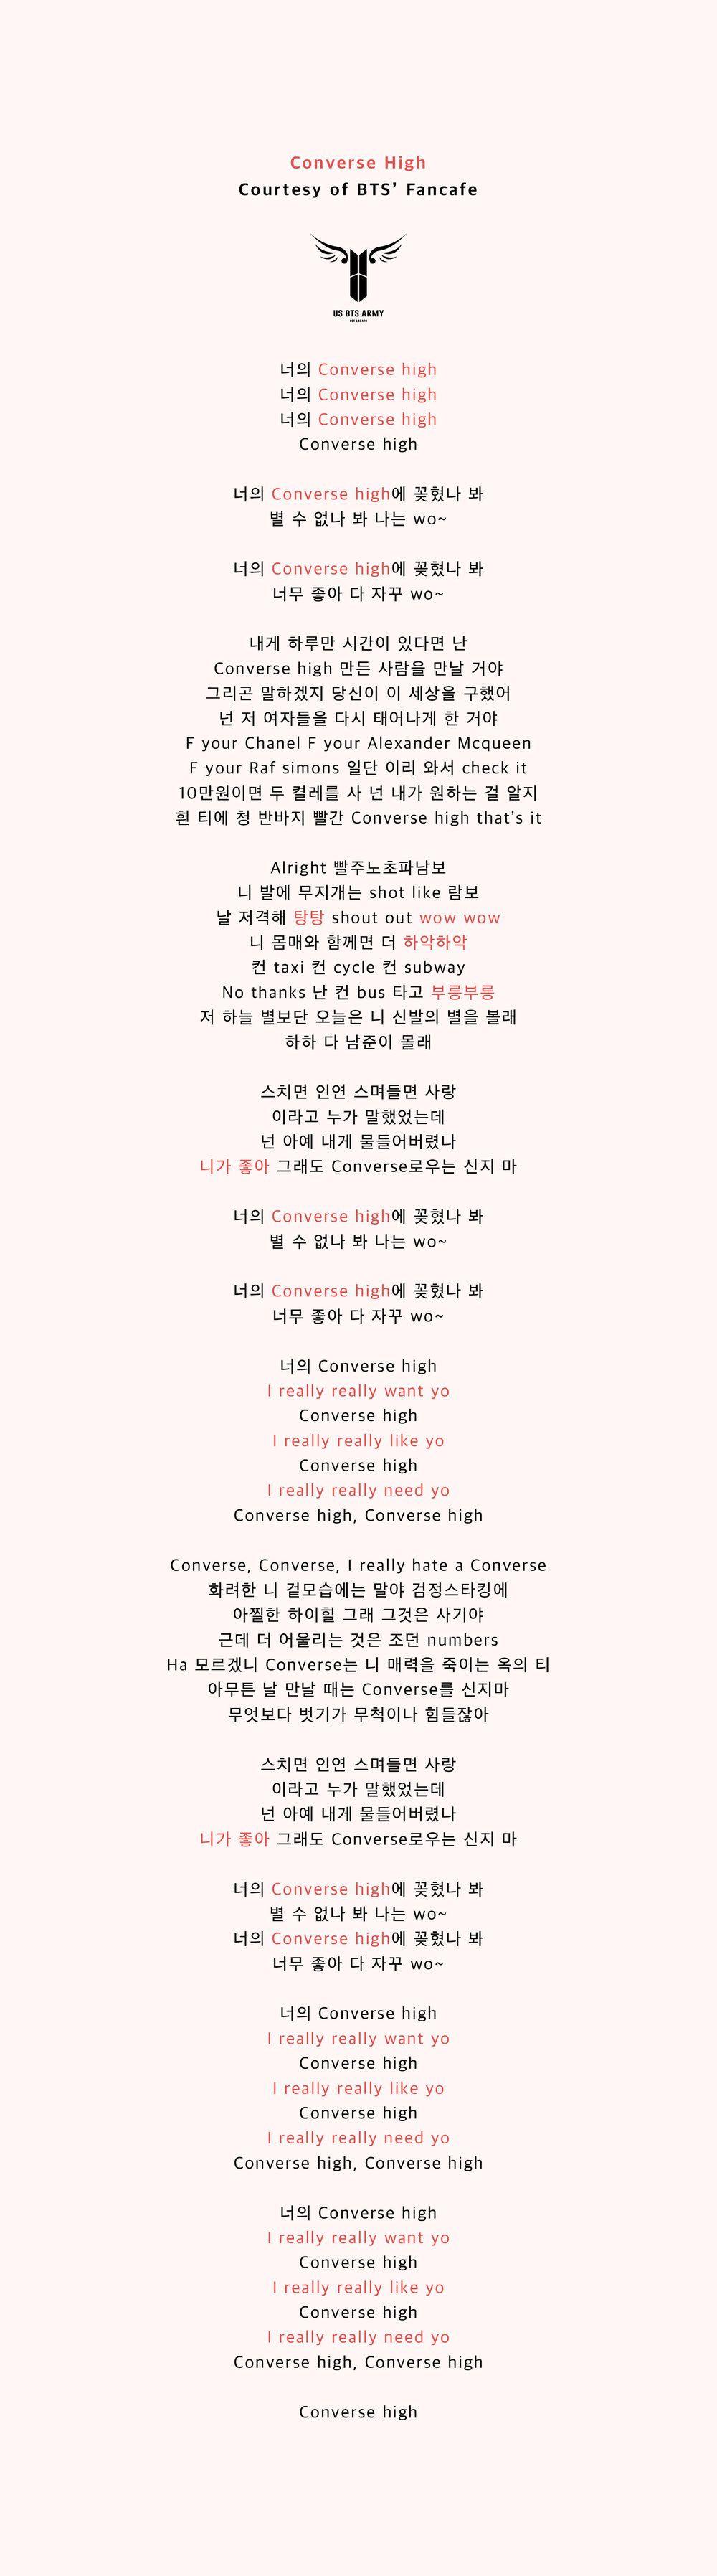 Converse High Lyrics English : converse, lyrics, english, الماركسية, مدفع, يستنشق, Converse, Lyrics, Consultoriaorigenydestino.com